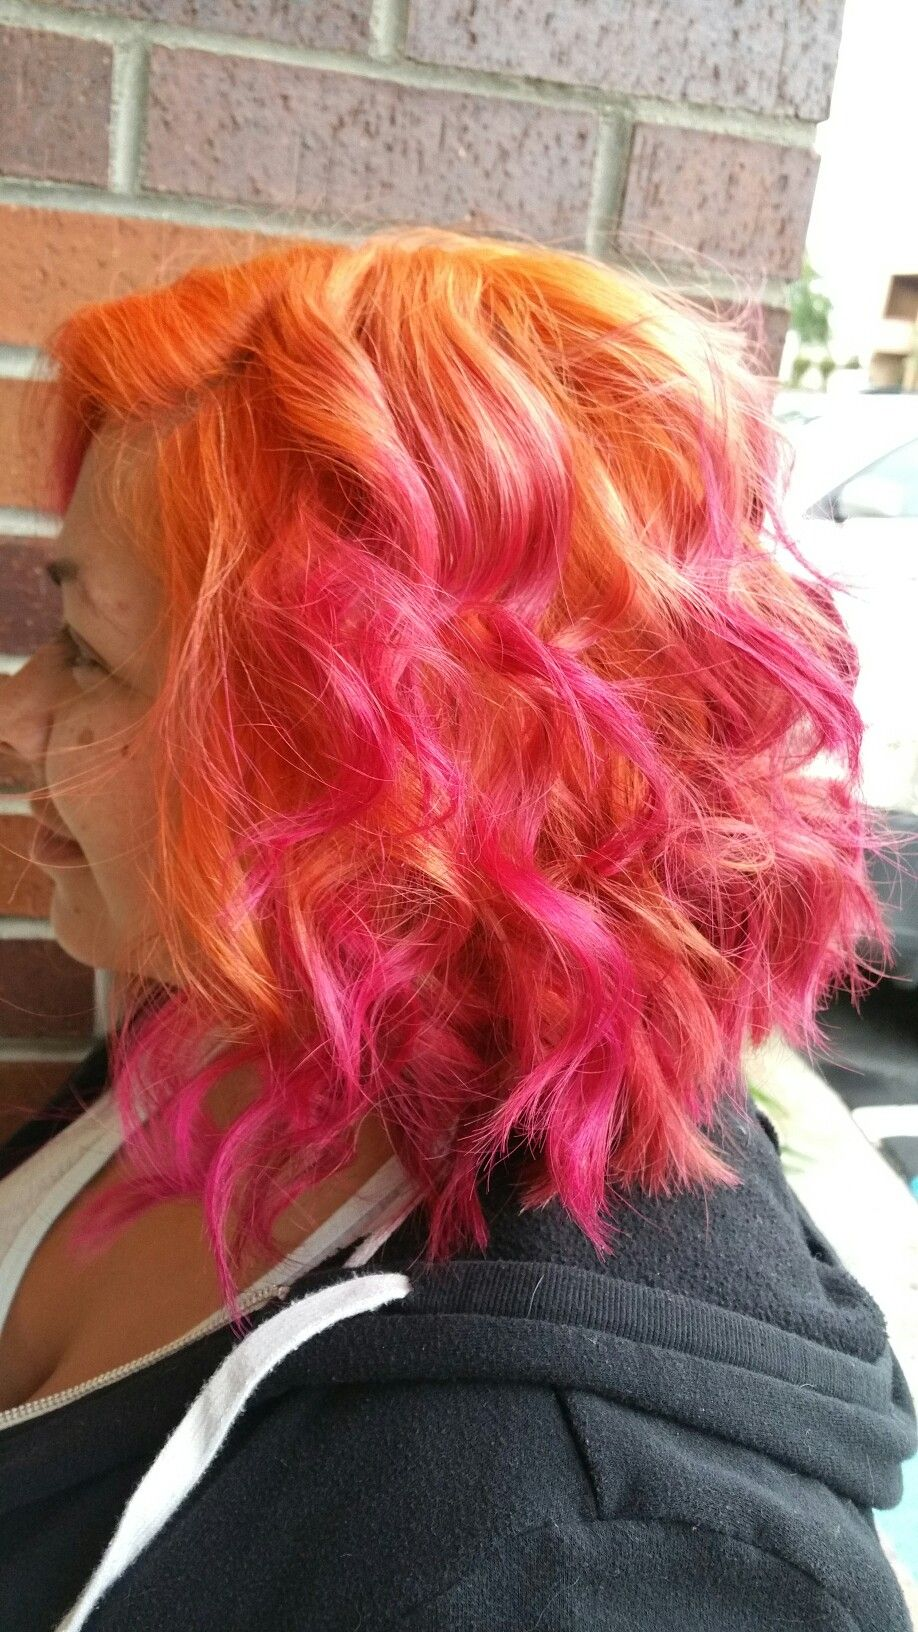 Jamie S Hair Design And Day Spa Pink And Orange Hair Hair Designs Pink Short Hair